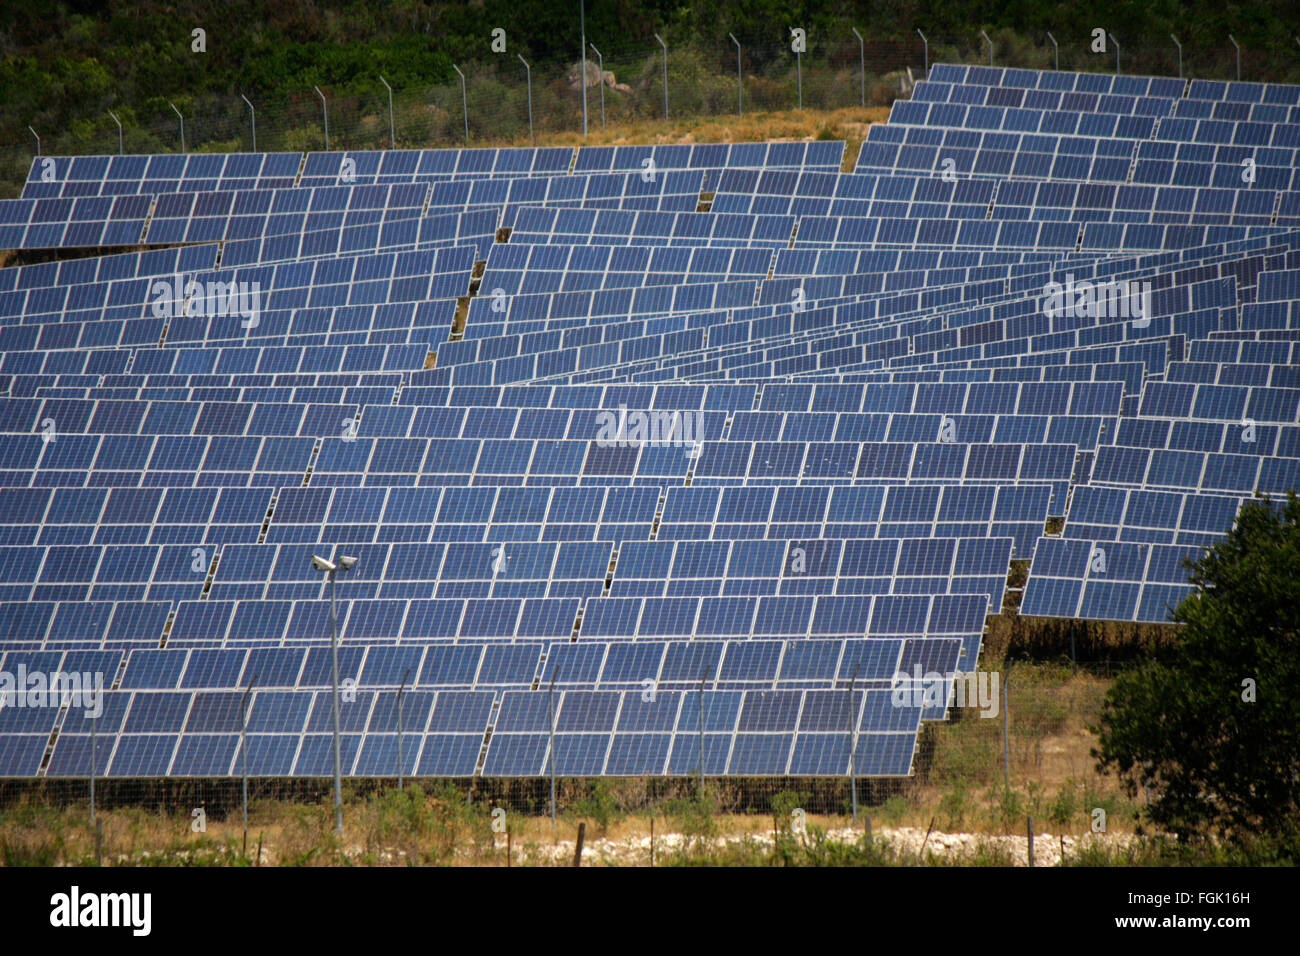 Solarenergie, Korsika, Frankreich. - Stock Image